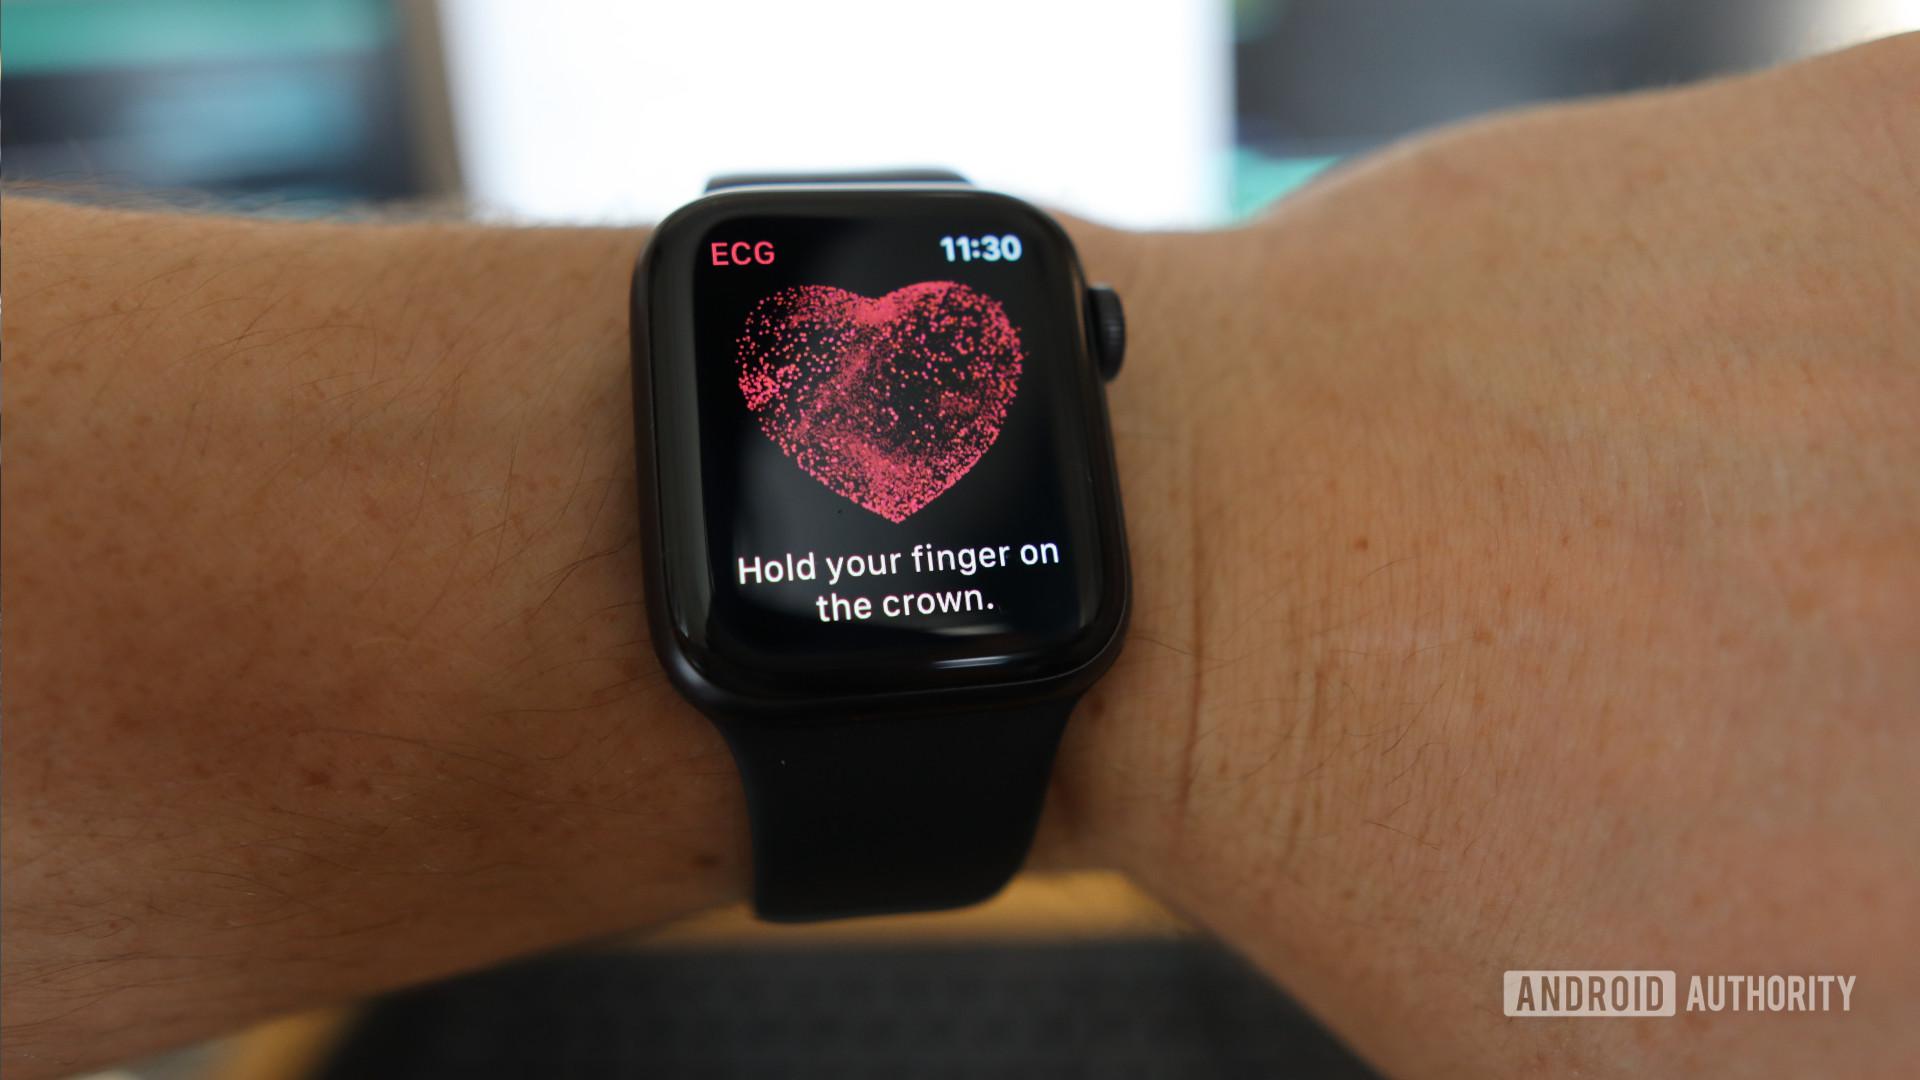 ECG Apple Watch App